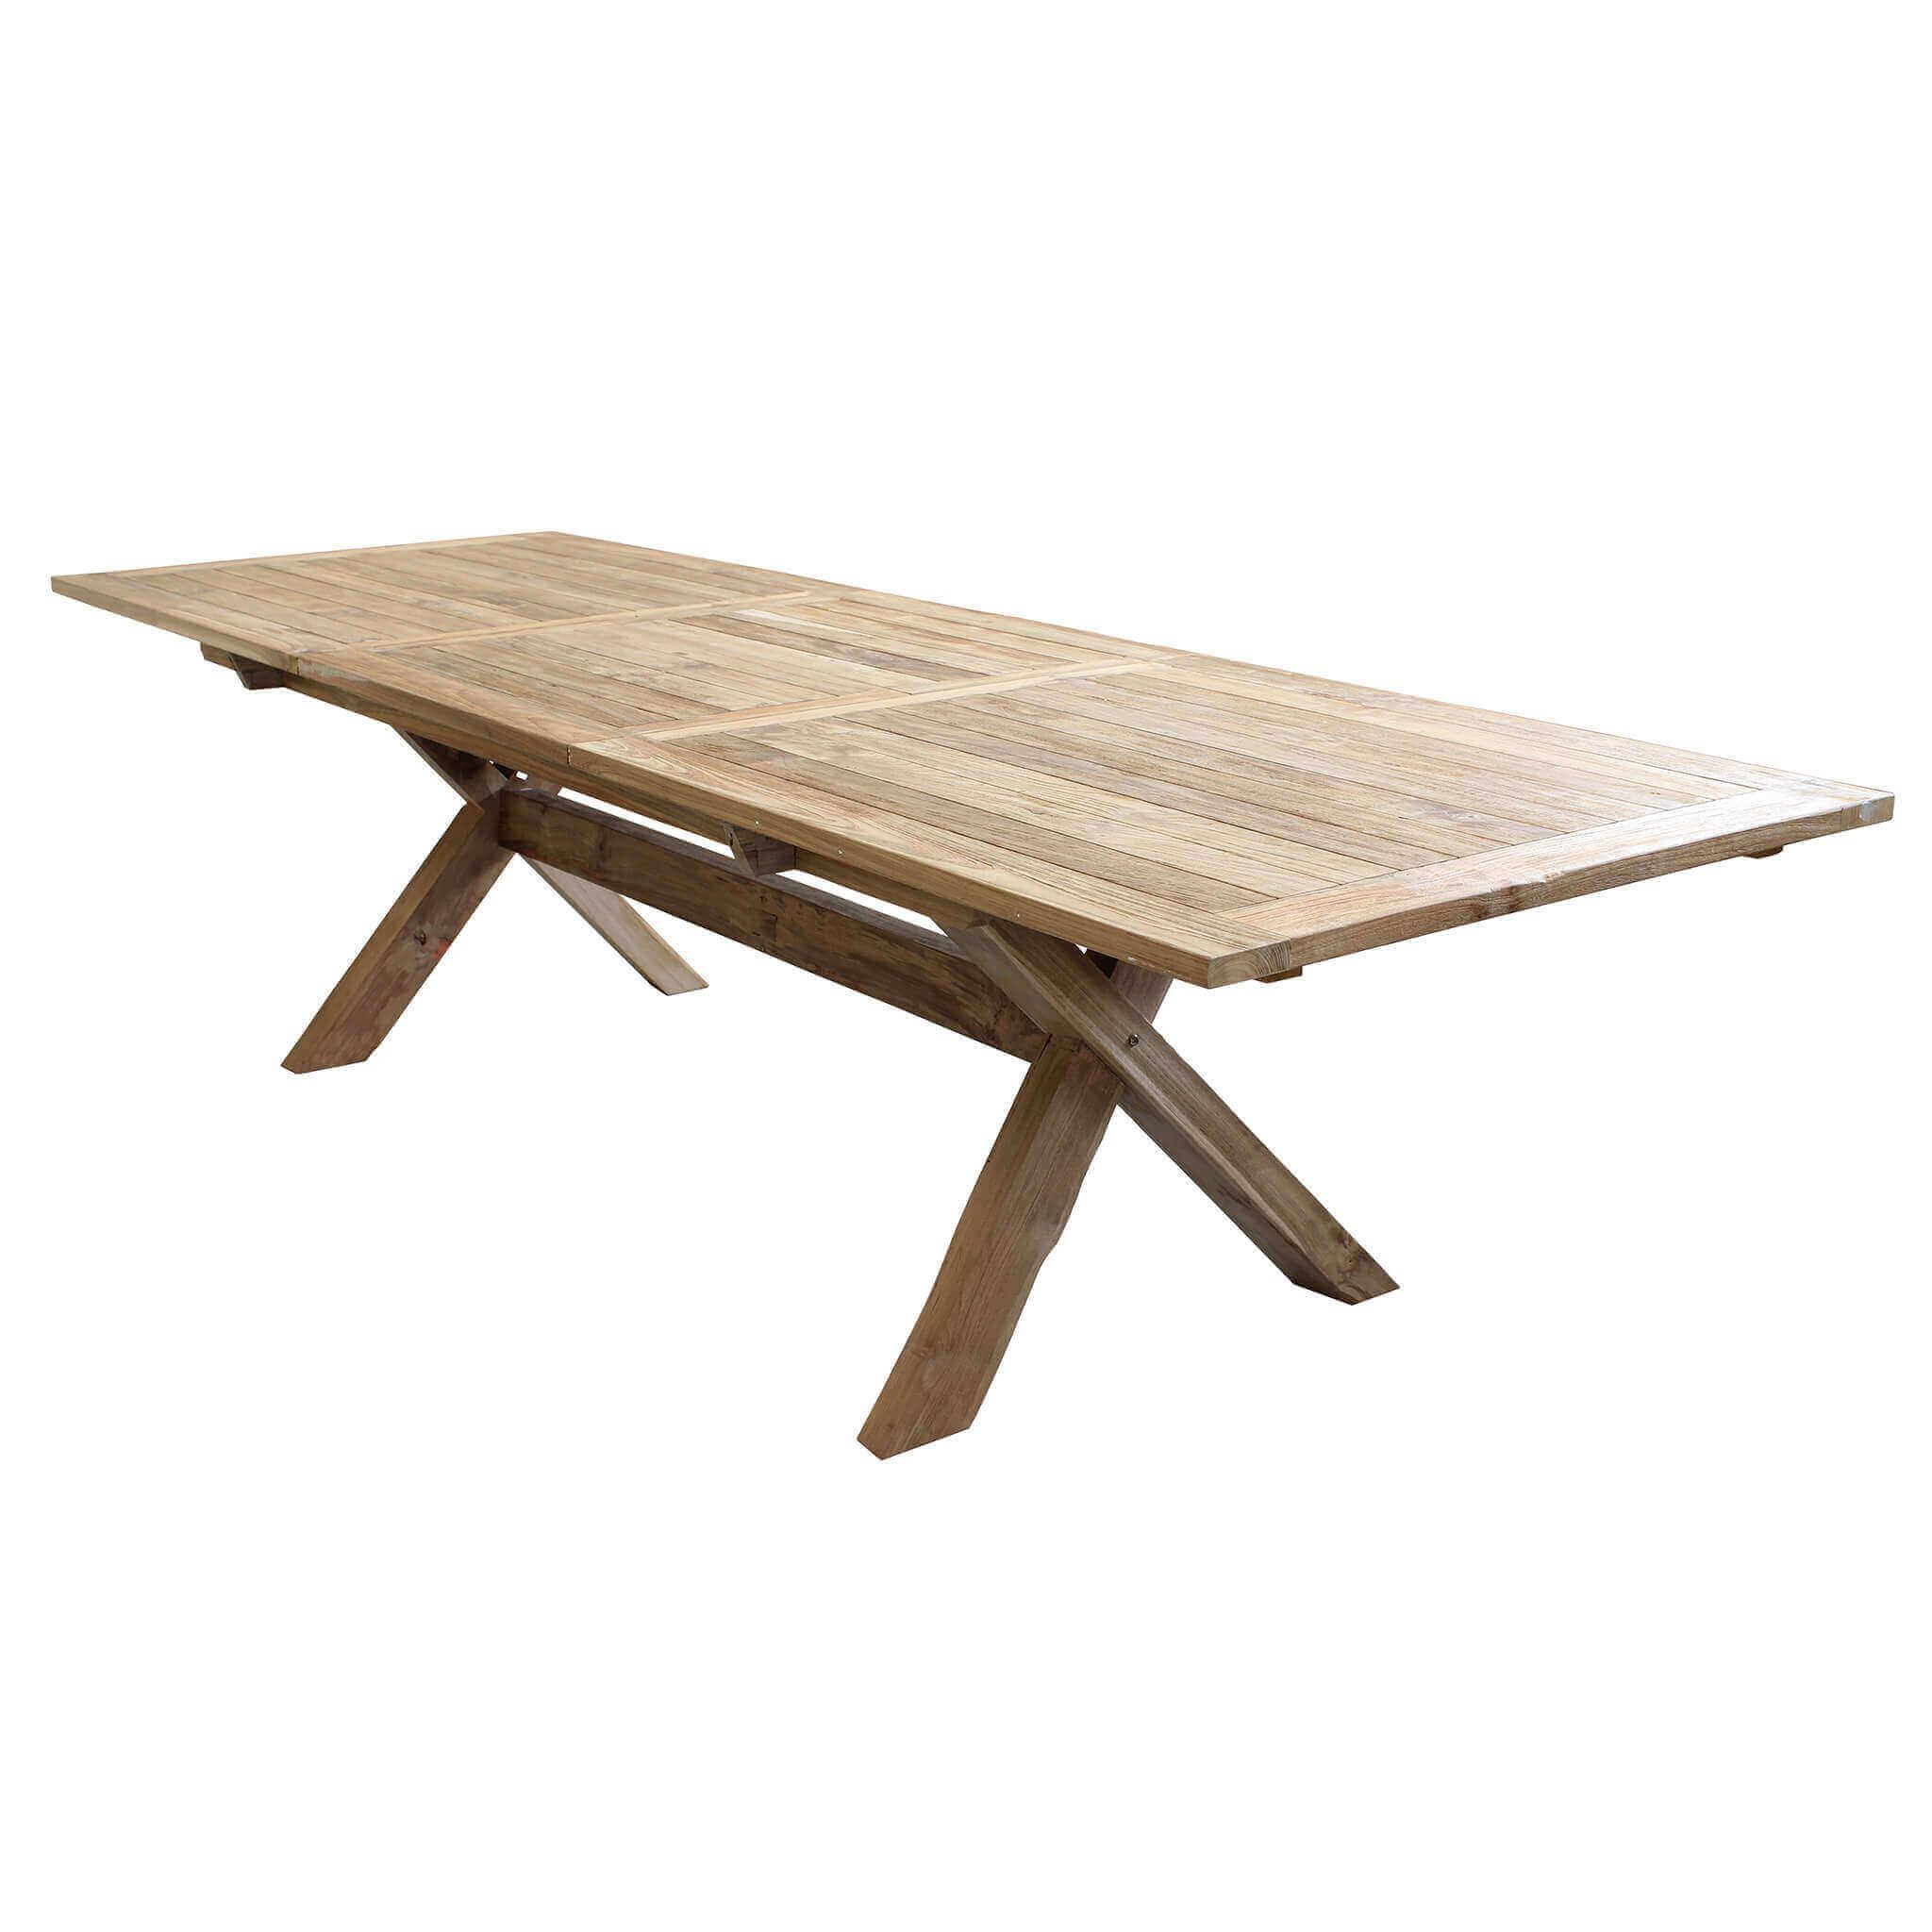 Milani Home XENIA - tavolo da giardino allungabile in teak 220/300 x 100